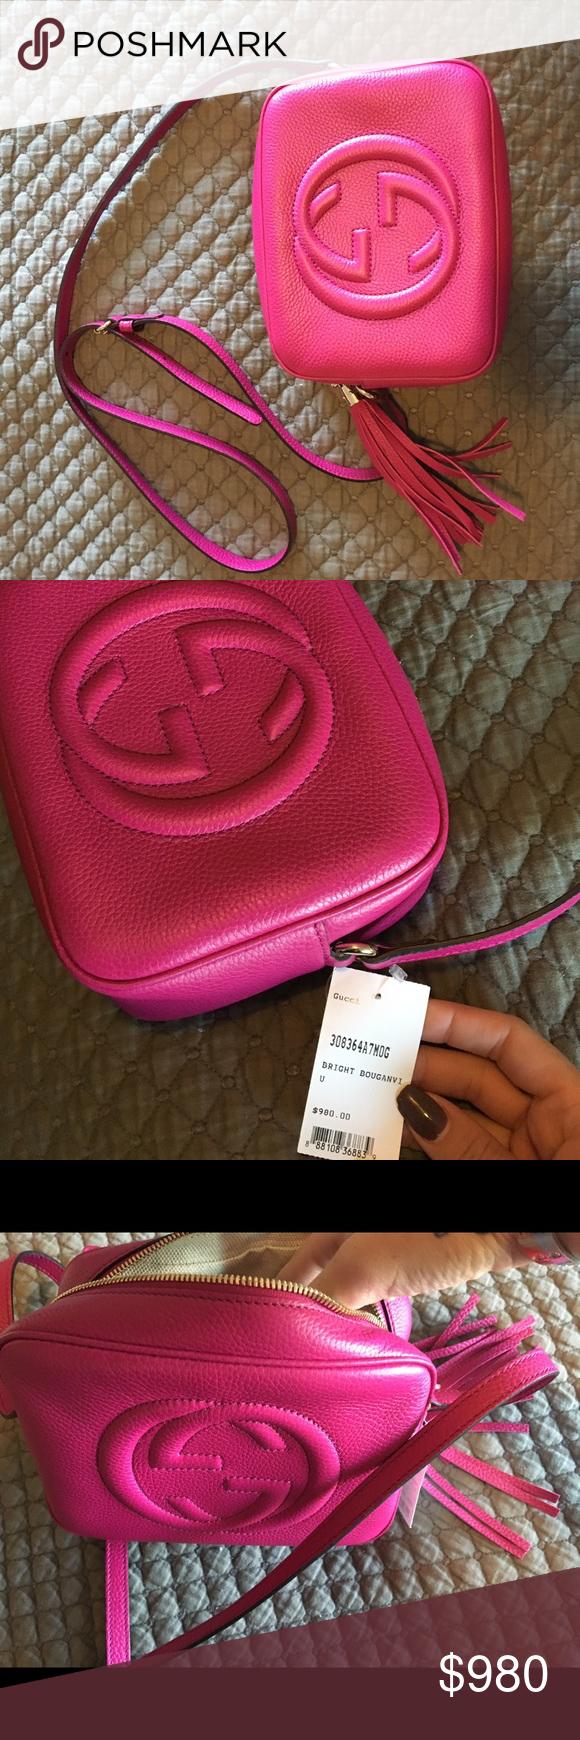 Bright pink Gucci bag Gucci pink soho bag Gucci Bags Crossbody Bags